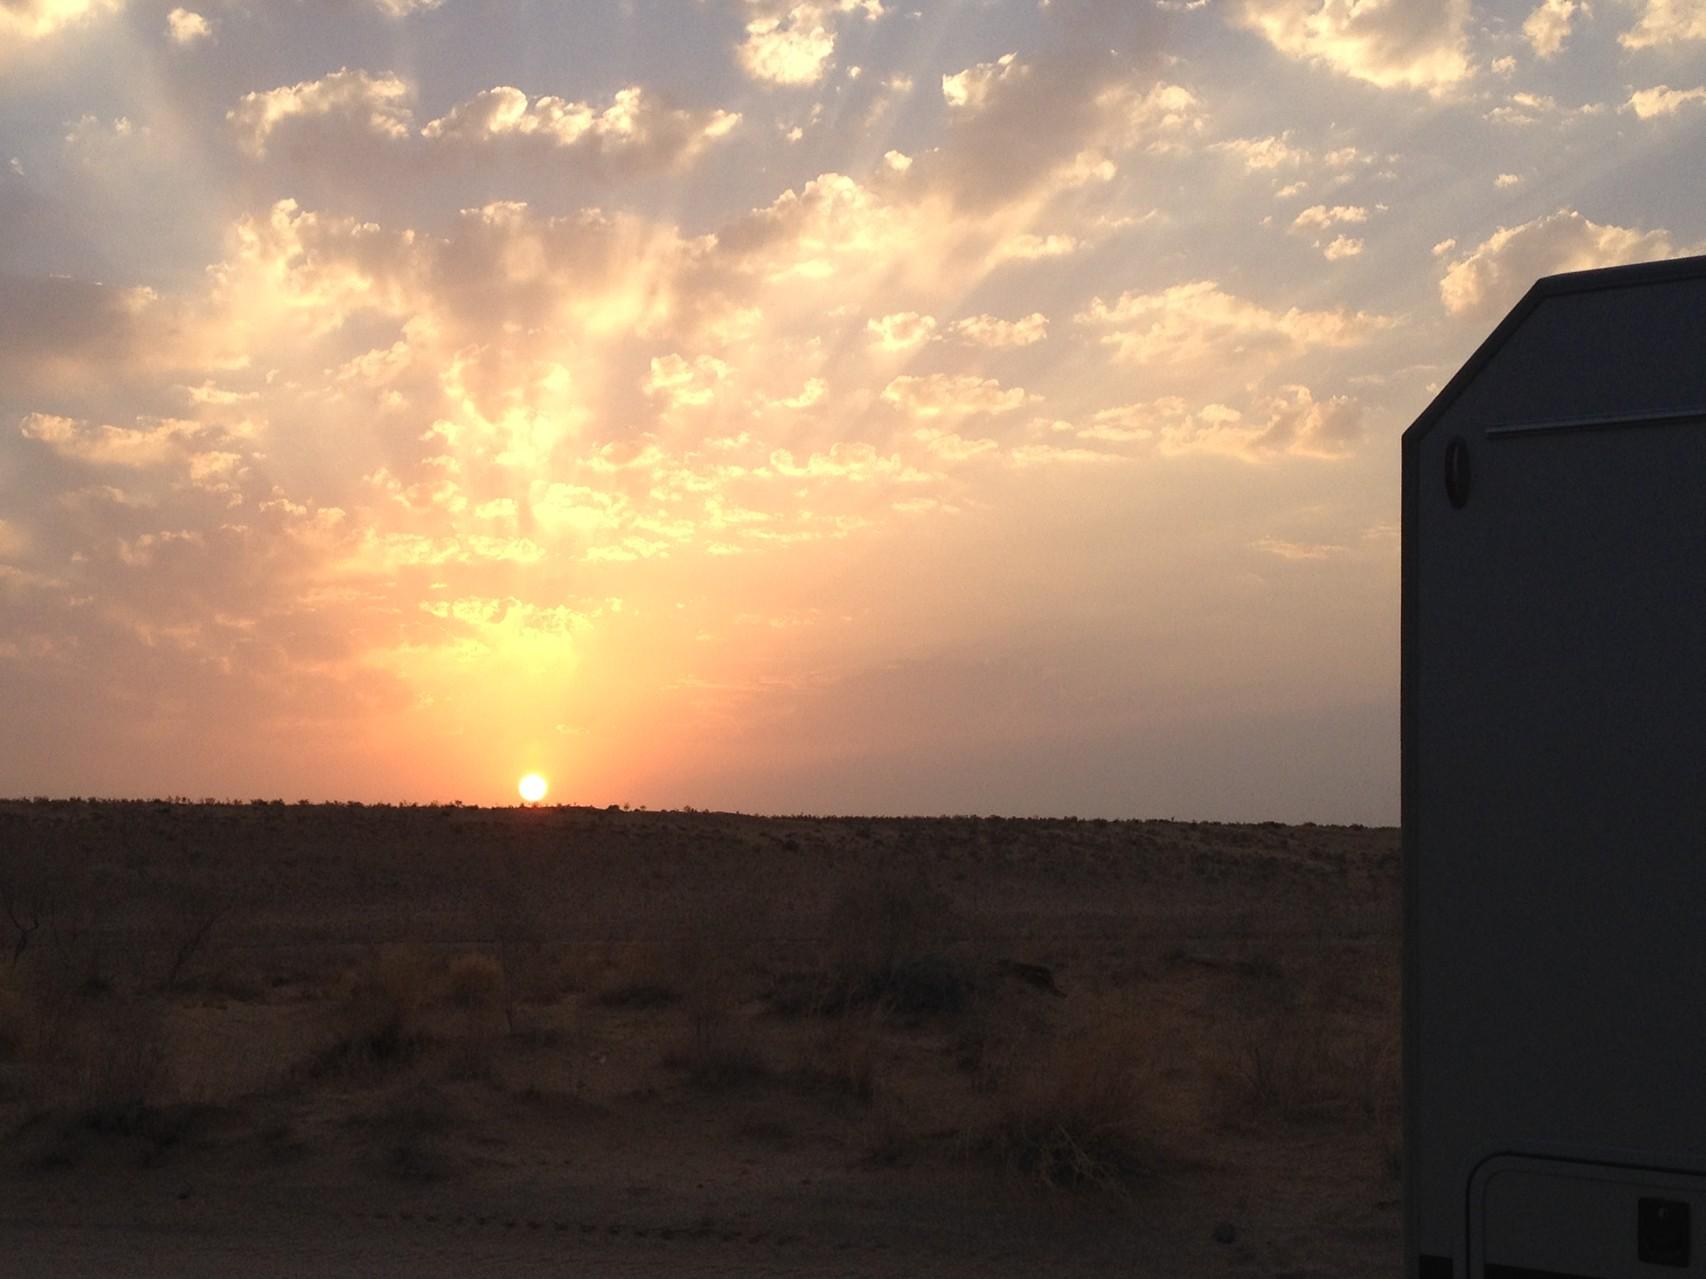 Sonnenaufgang beim Gaskrater